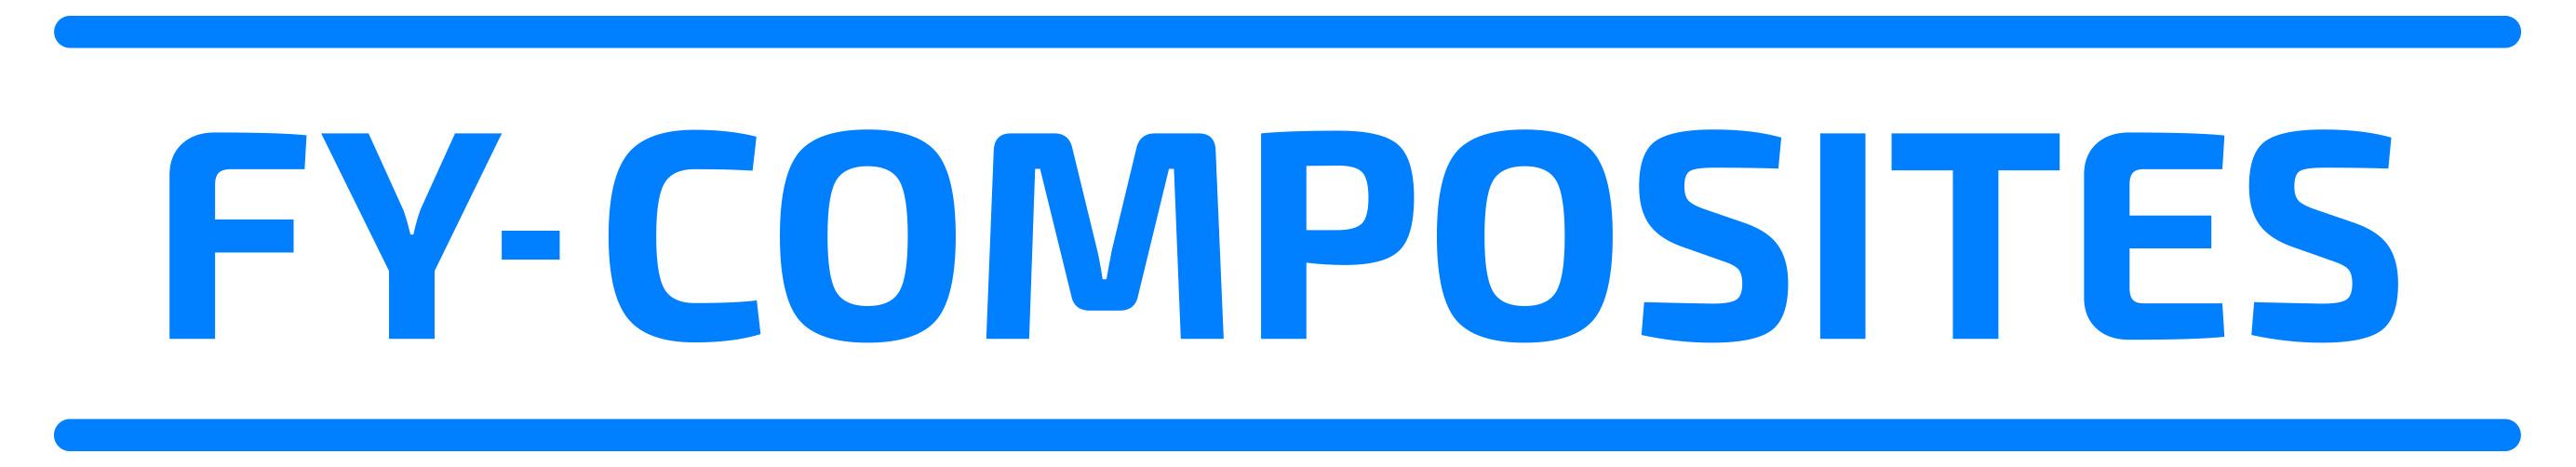 Logo: FY-Composites Oy